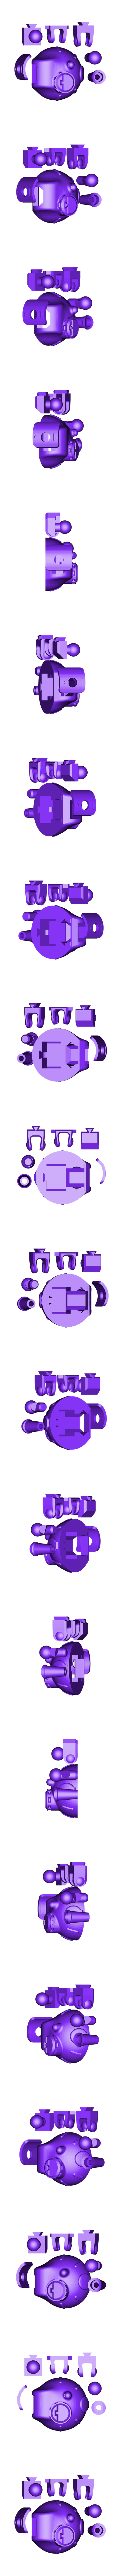 TURRET_ASSEMBLY.STL Télécharger fichier STL gratuit Gorbo Tankoped • Objet à imprimer en 3D, Steyrc